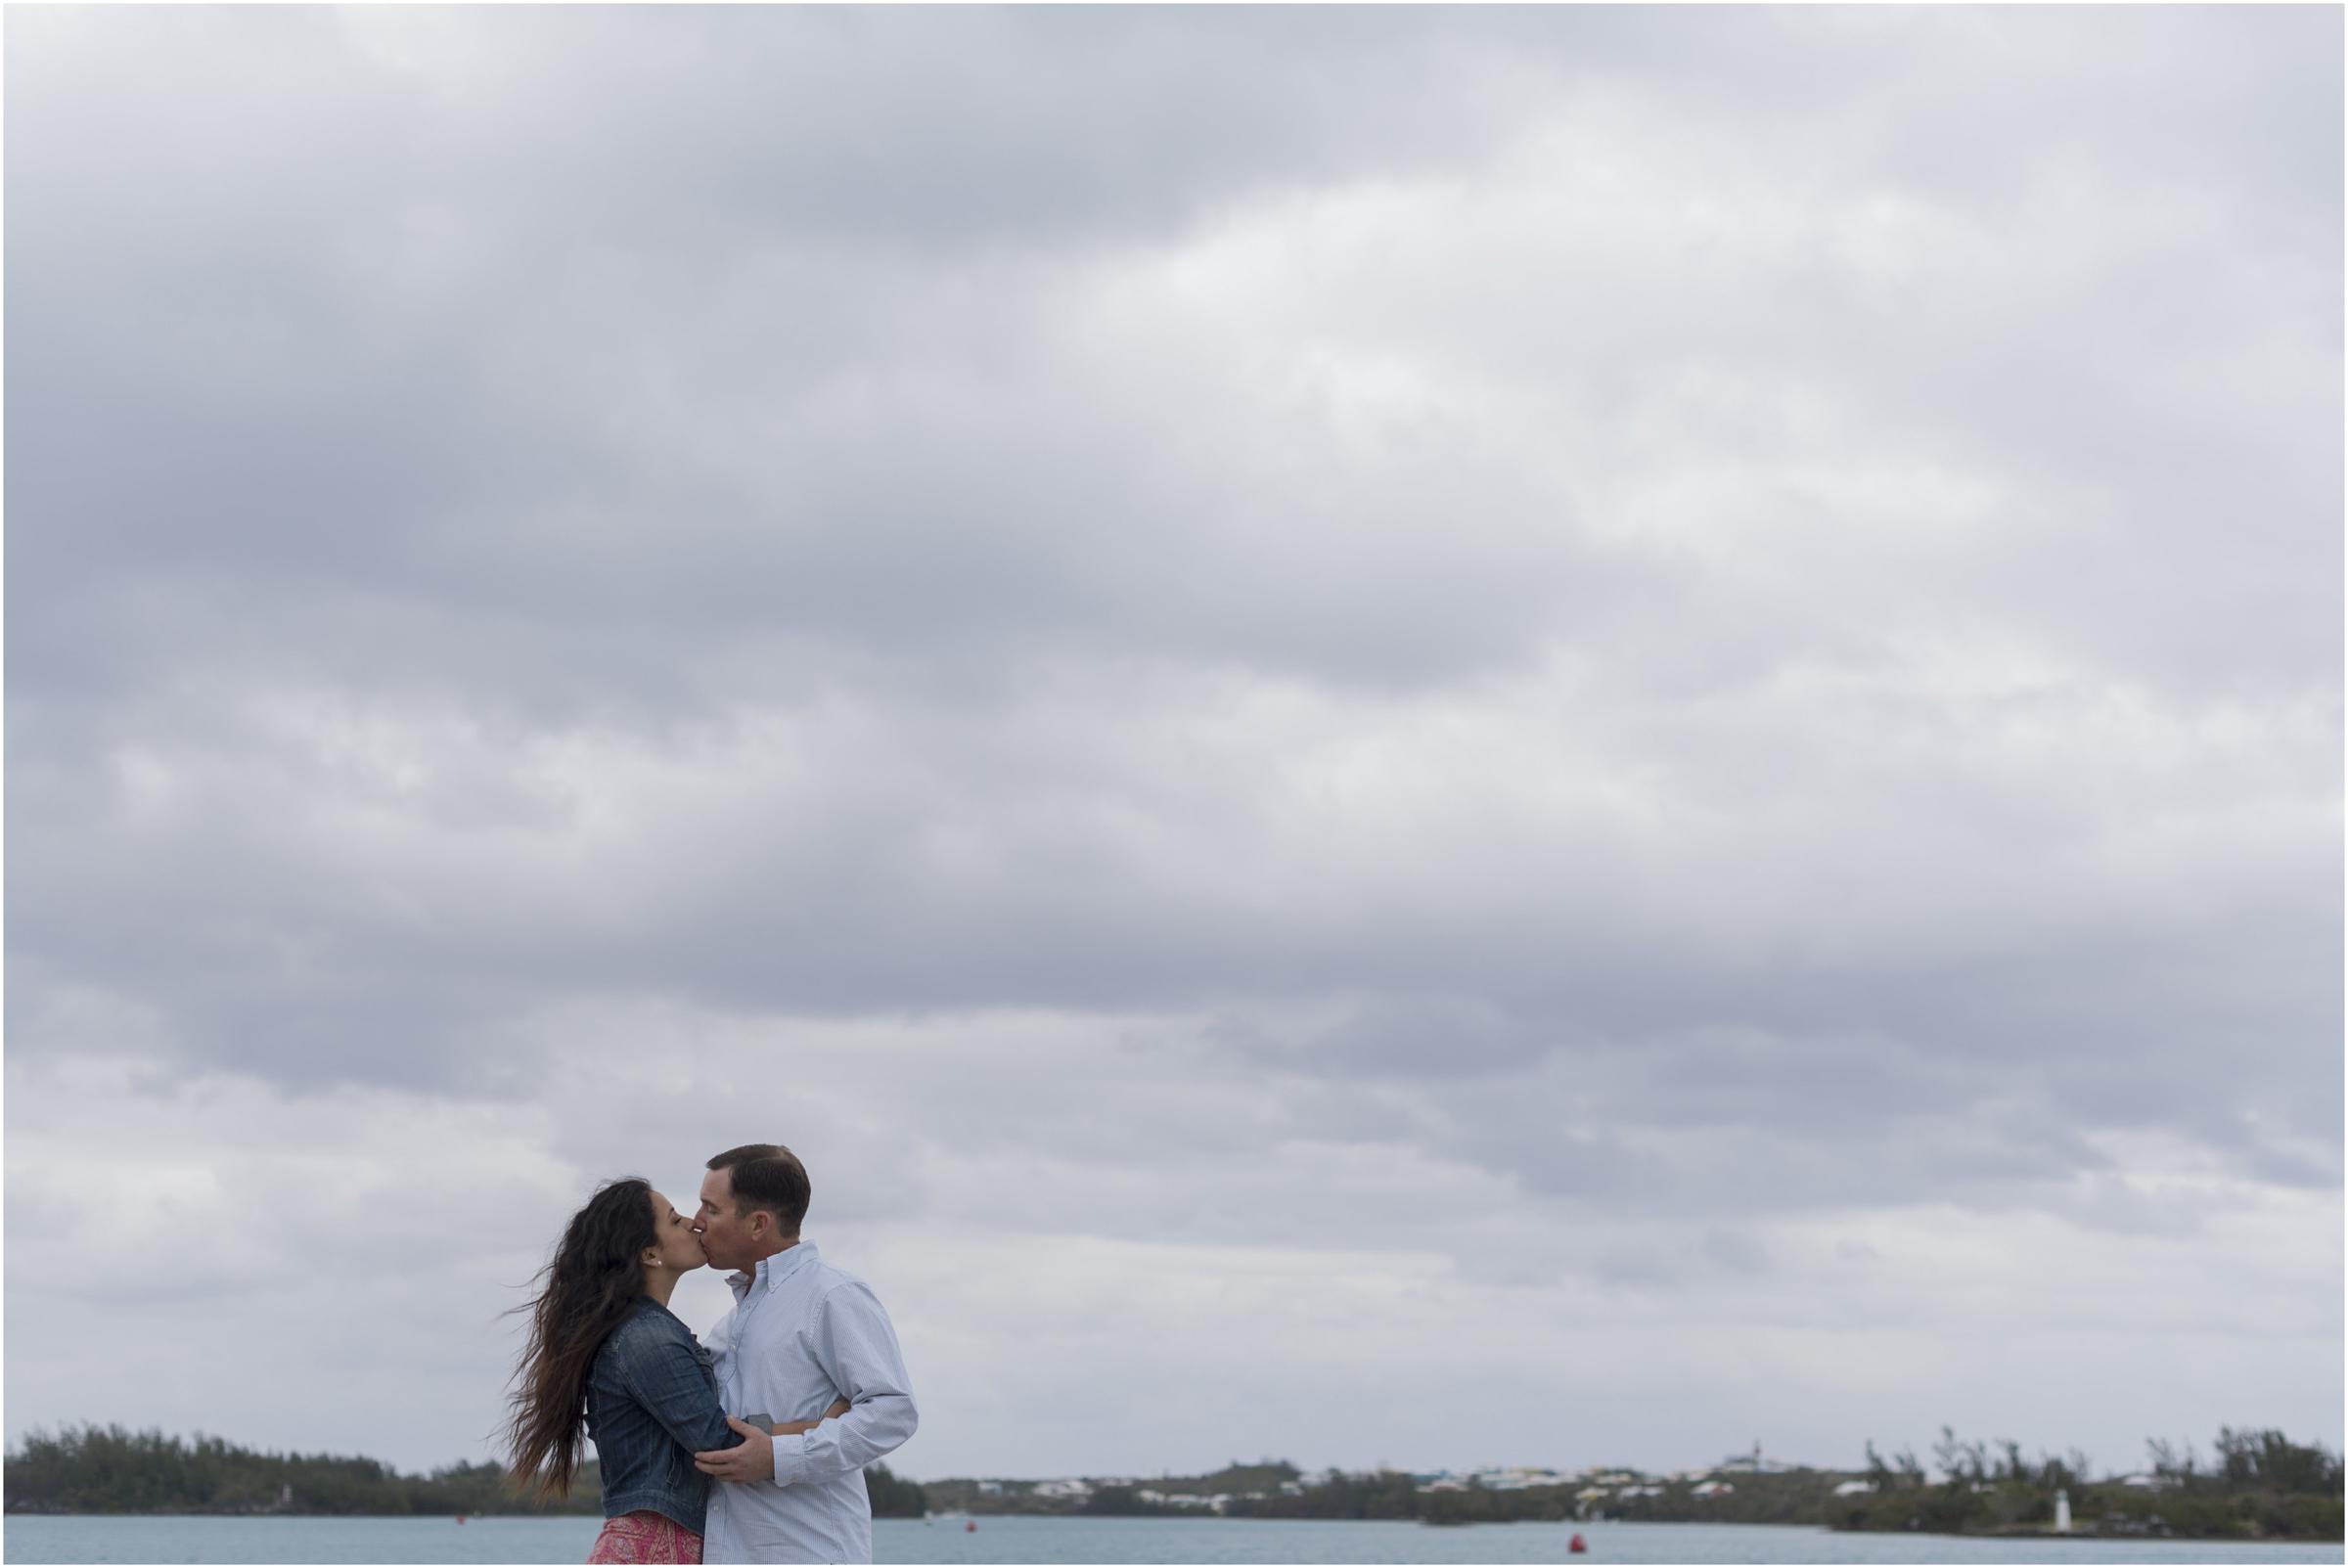 ©FianderFoto_Engagement_Lizzie_Slayton_8.jpg